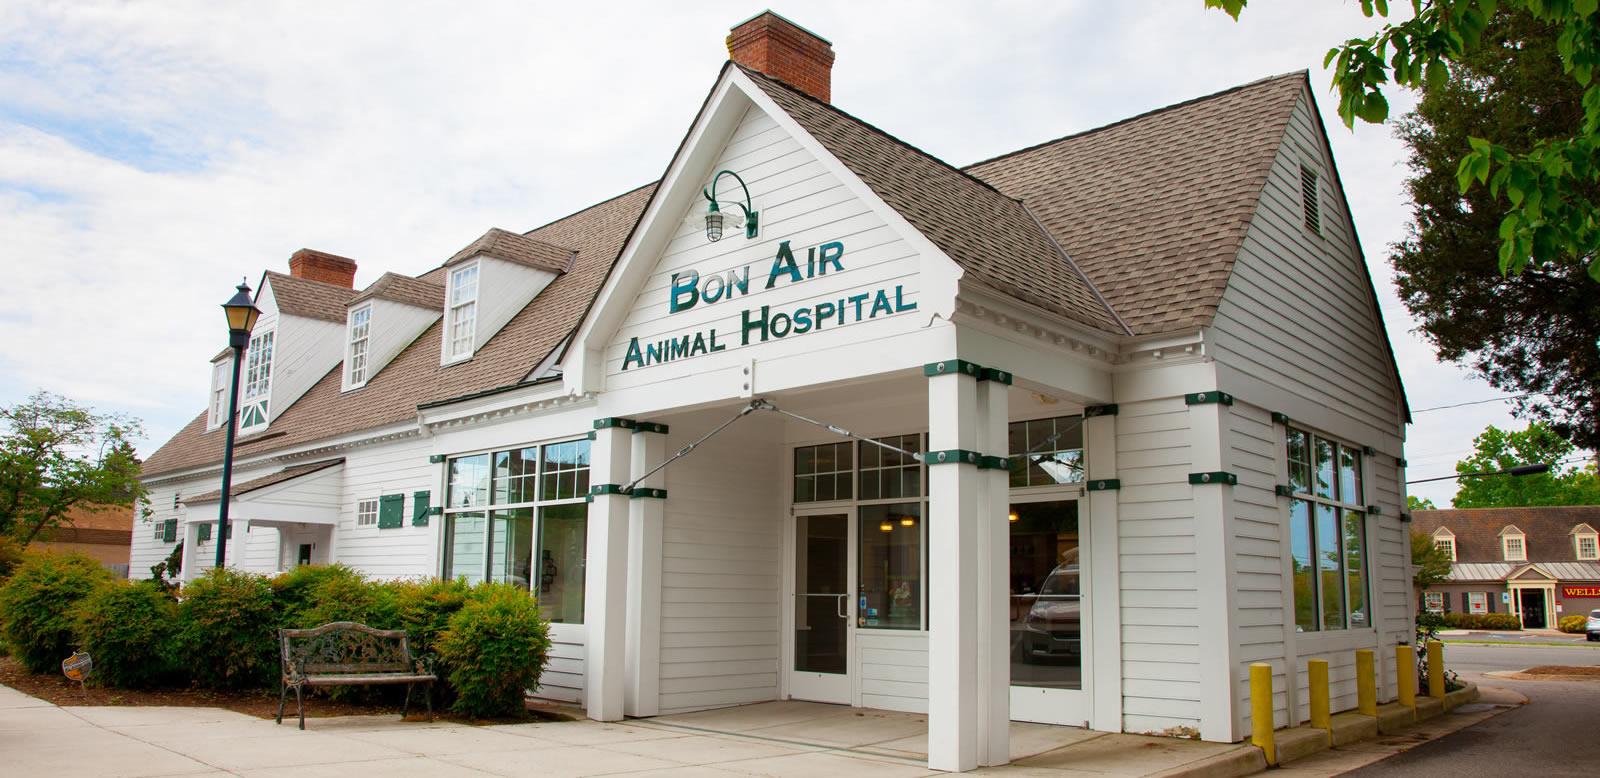 Bon Air Animal Hospital - Quality Veterinarian in Richmond, Virginia